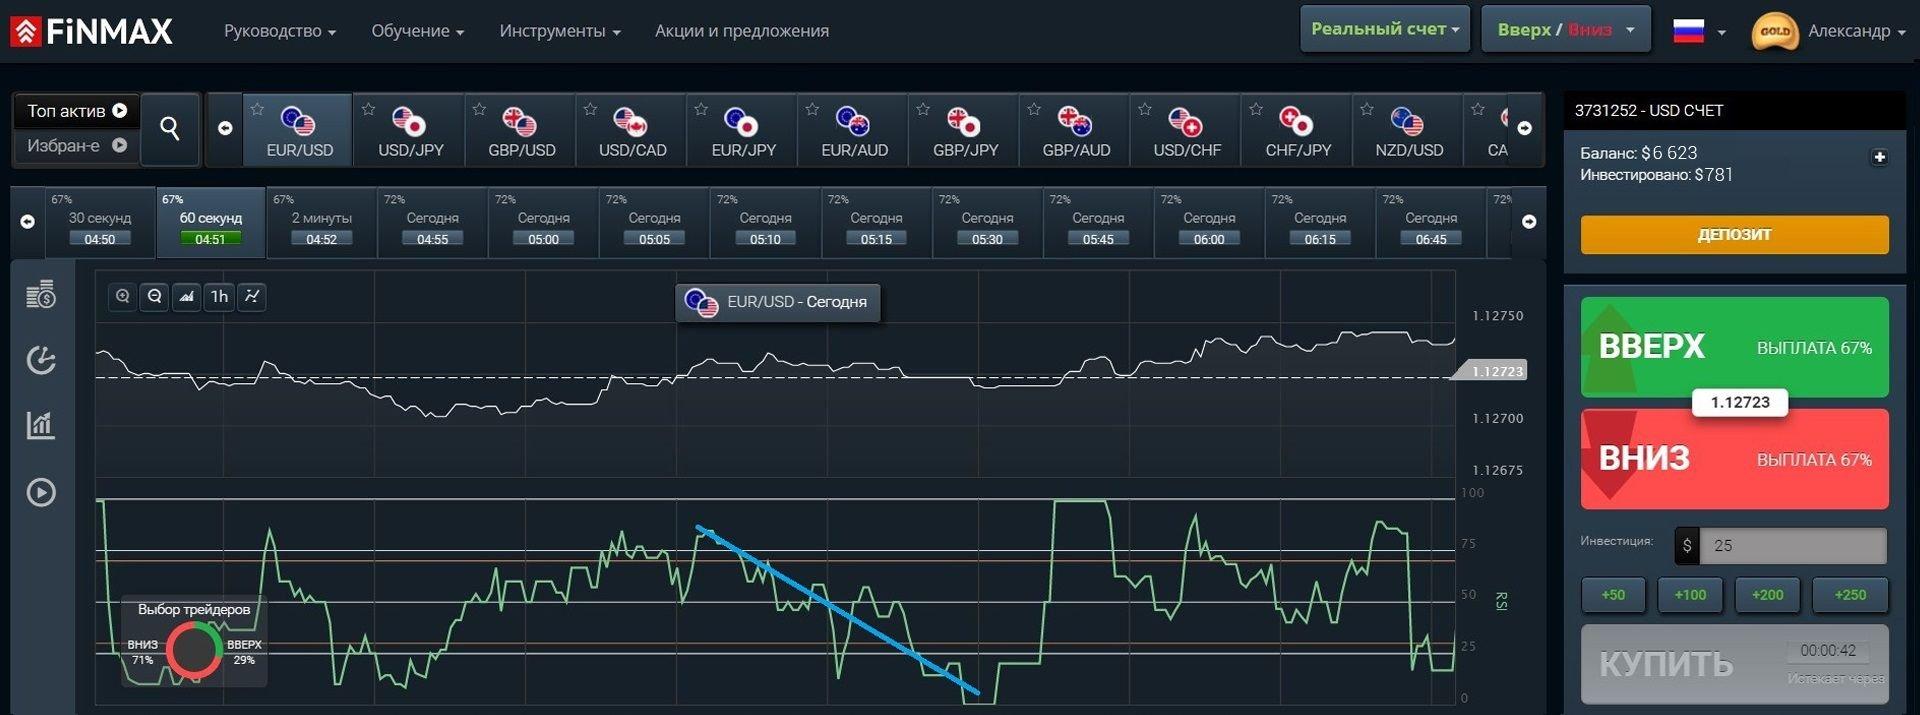 Нисходящая тенденция рынка на платформе брокера FinMax